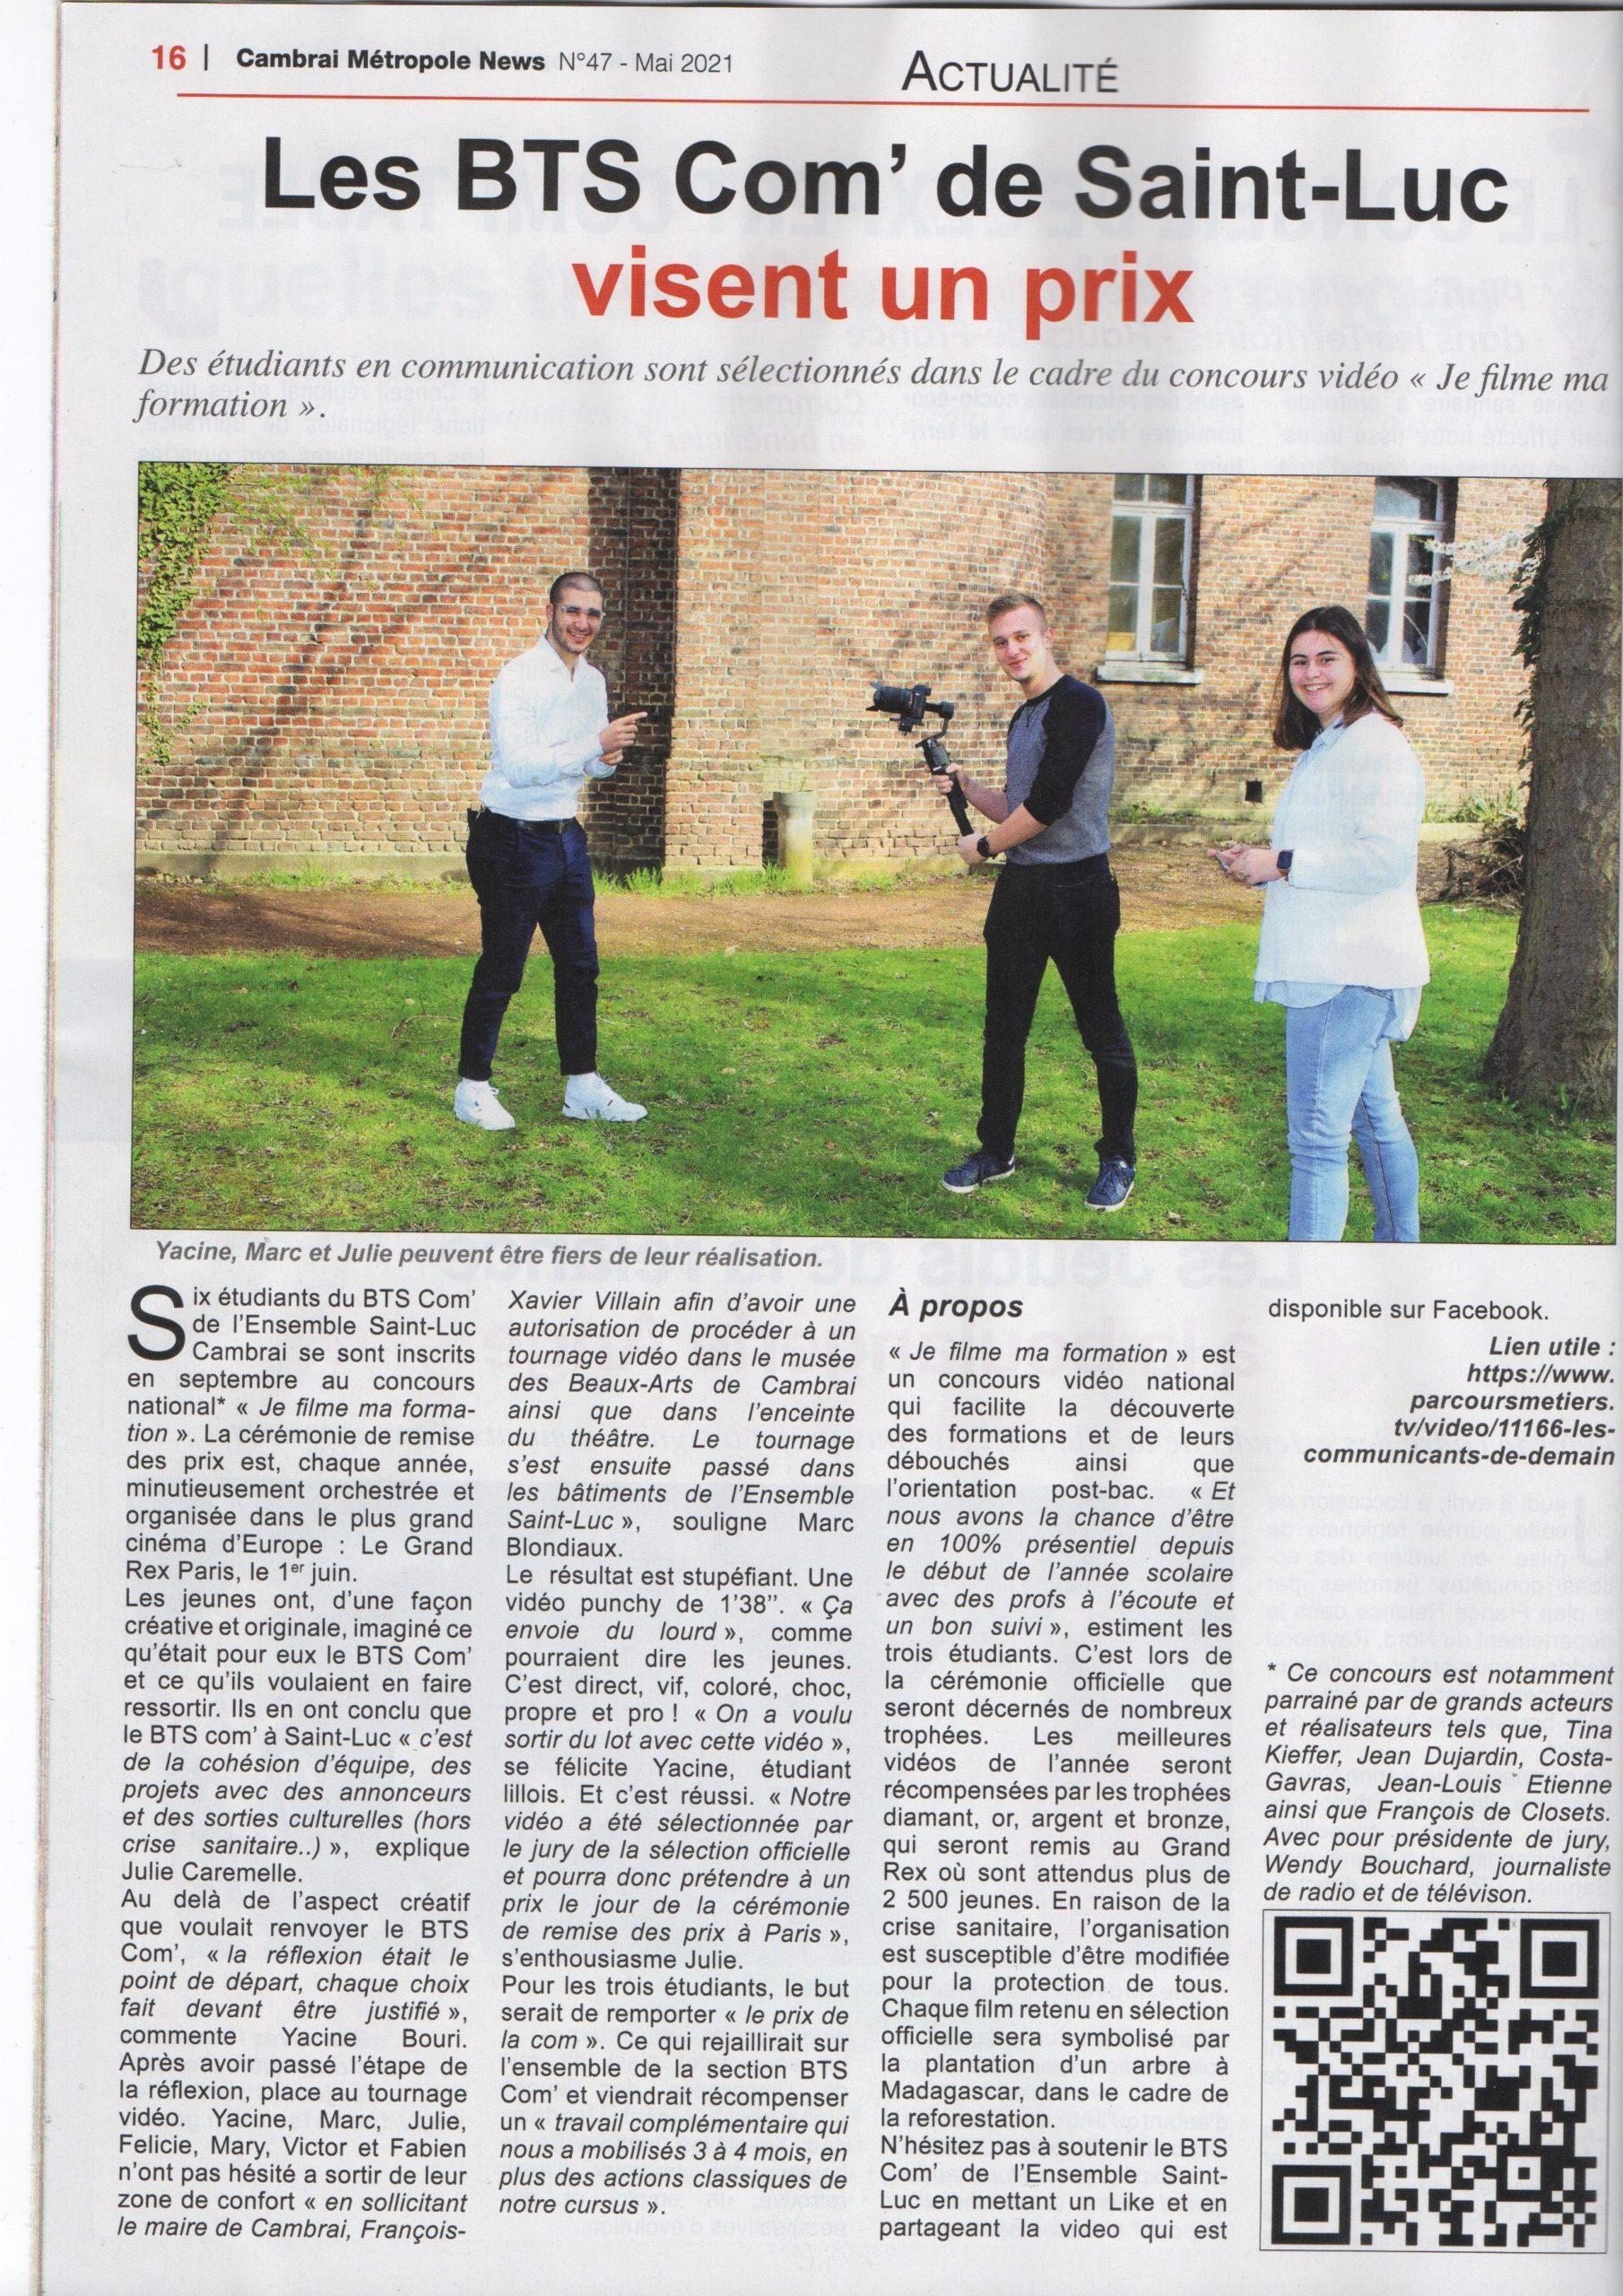 Cambrai Métropole News - 01/05/2021